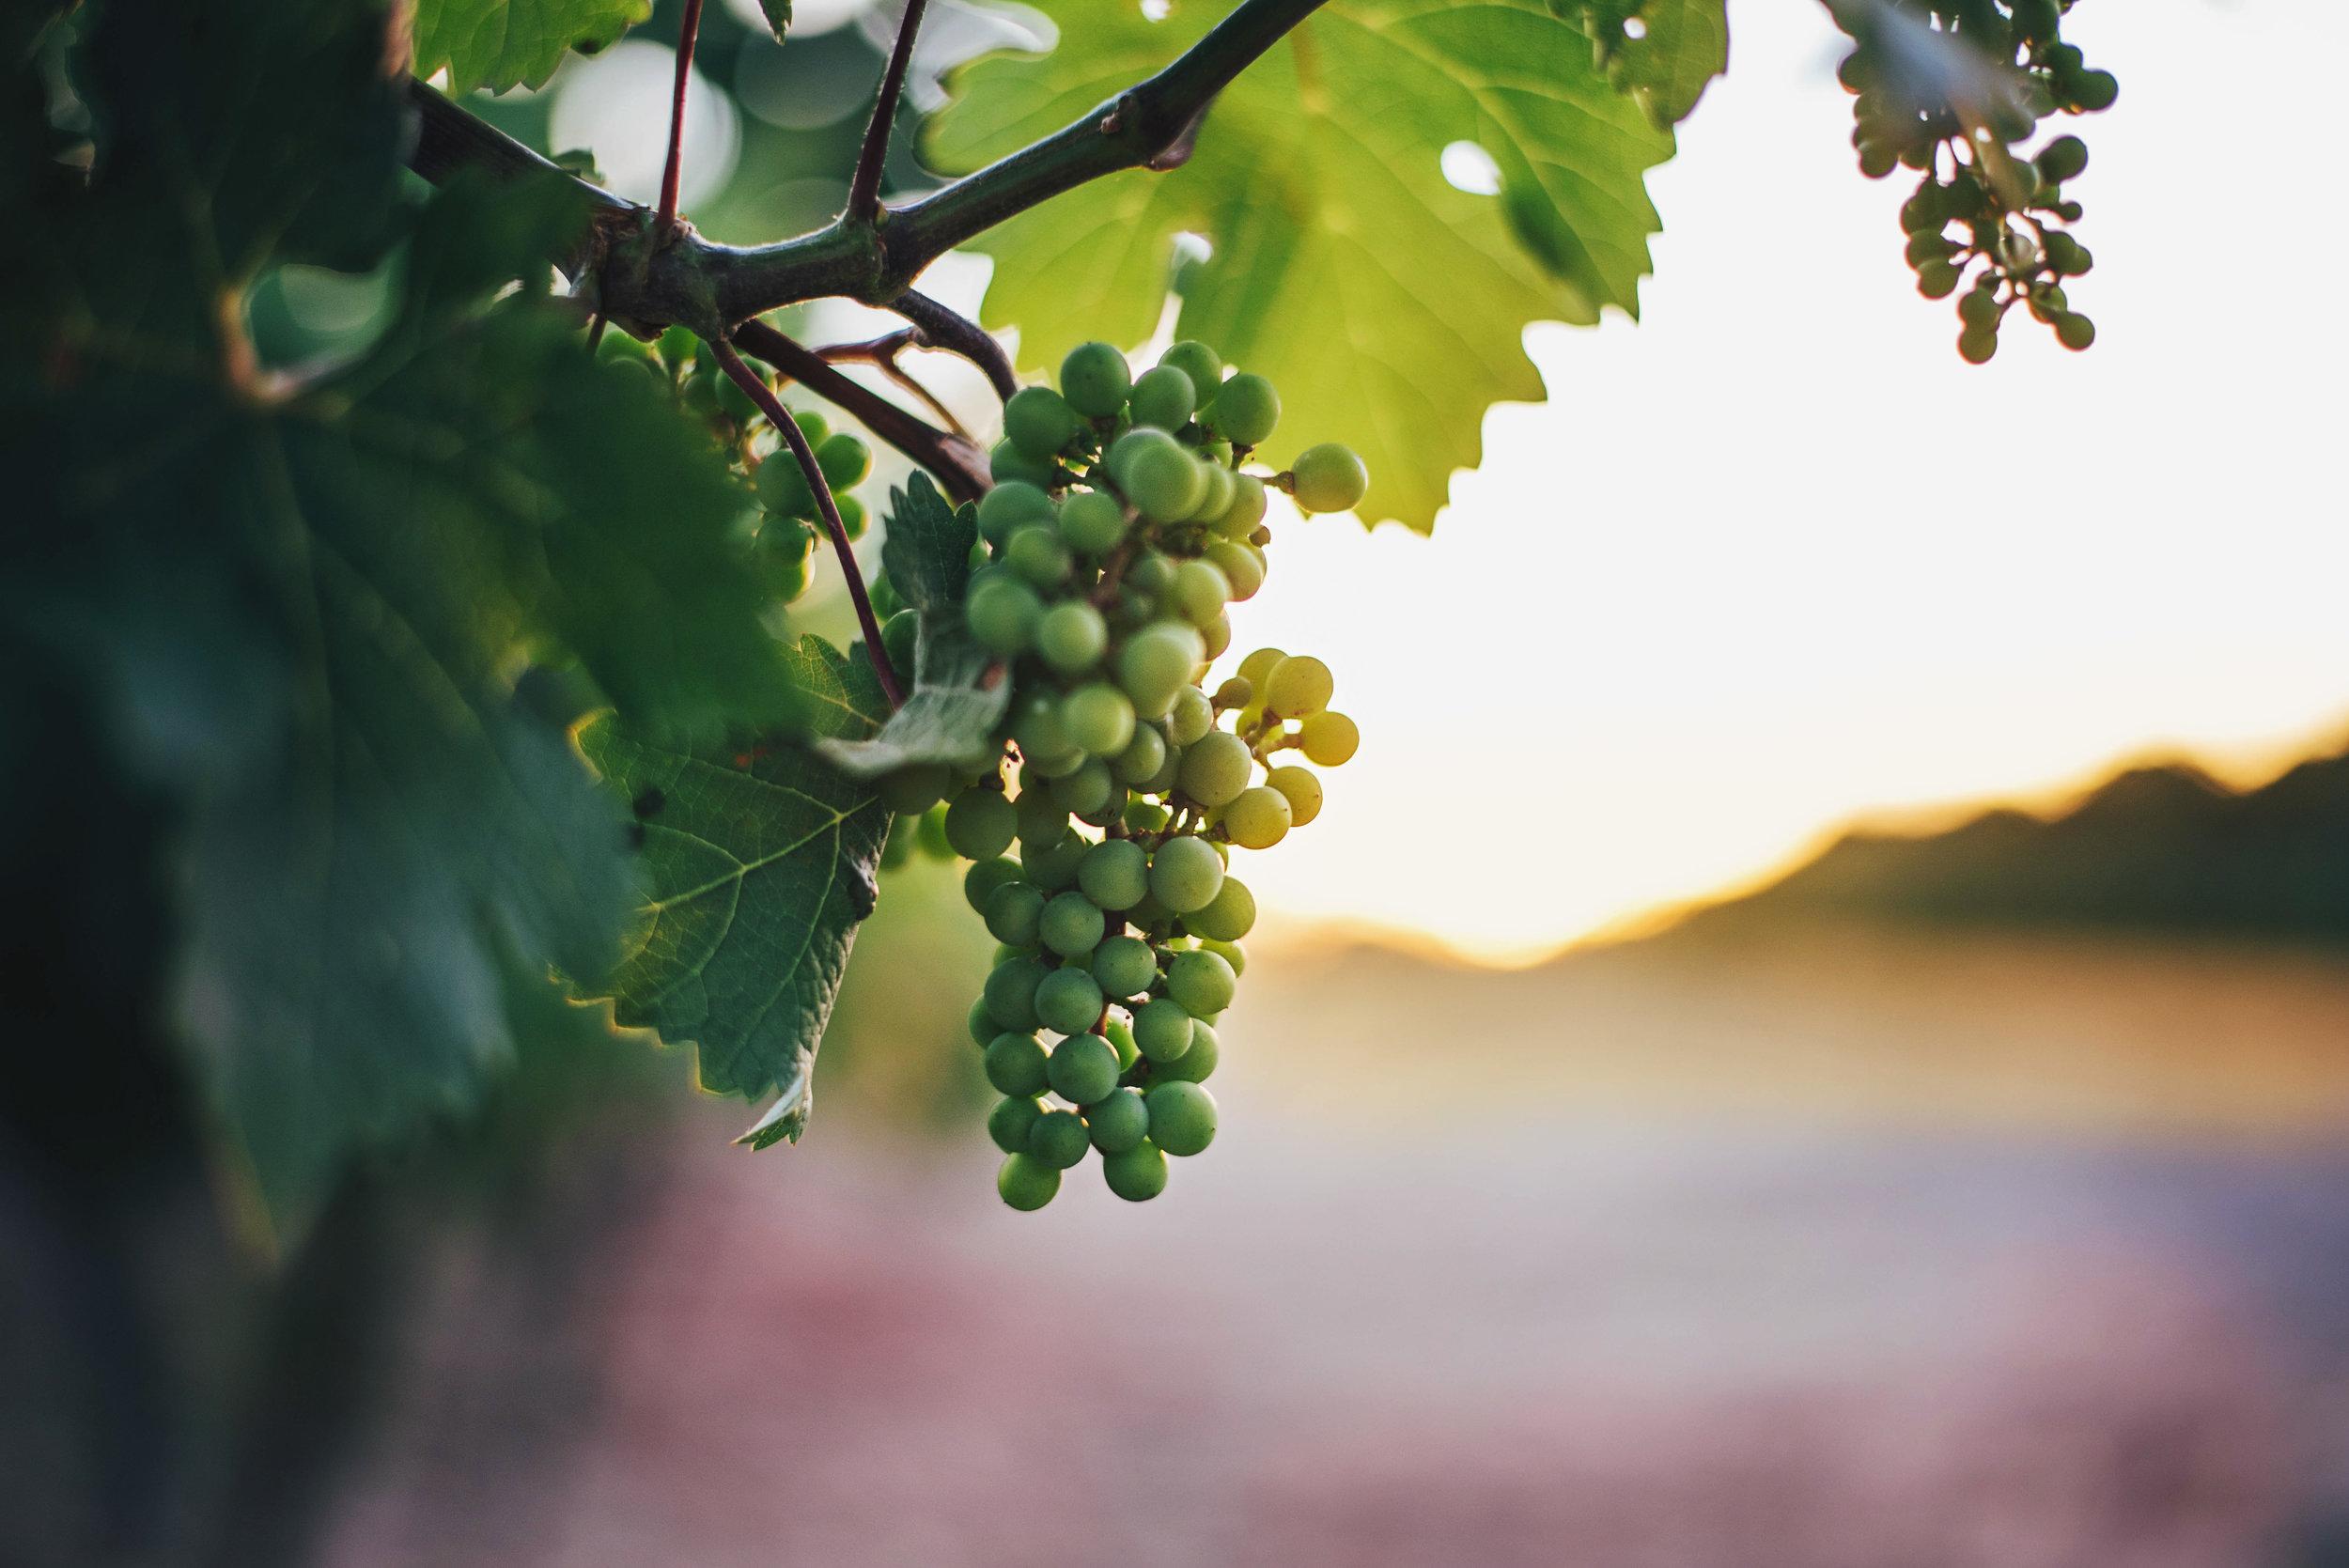 Grapes in vineyard Essex UK Documentary Photographer